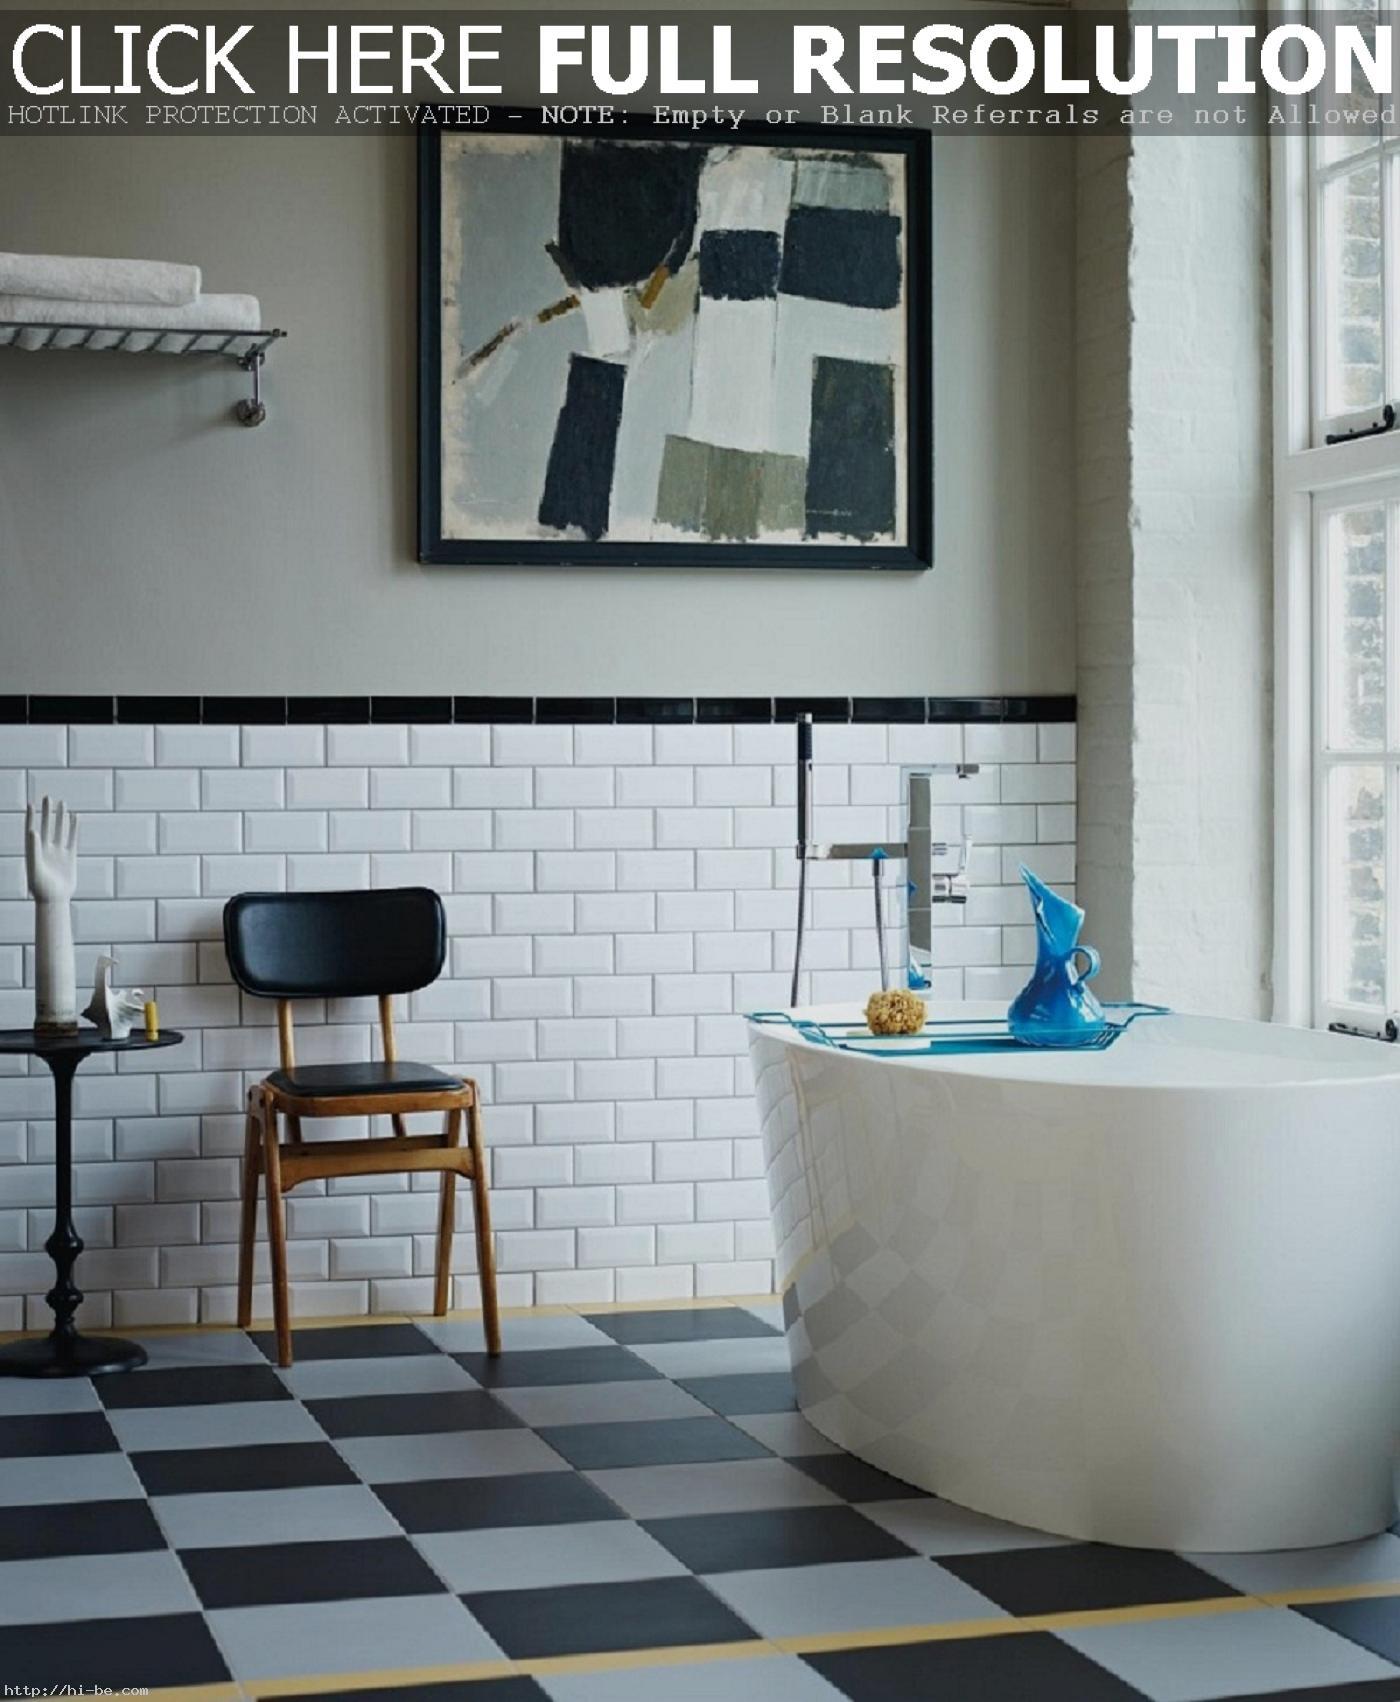 Metropolitan-Queensway-Fried-Earth-Listed-In-Black-White-Stylish-Loft-Bathroom-Ideas.jpg